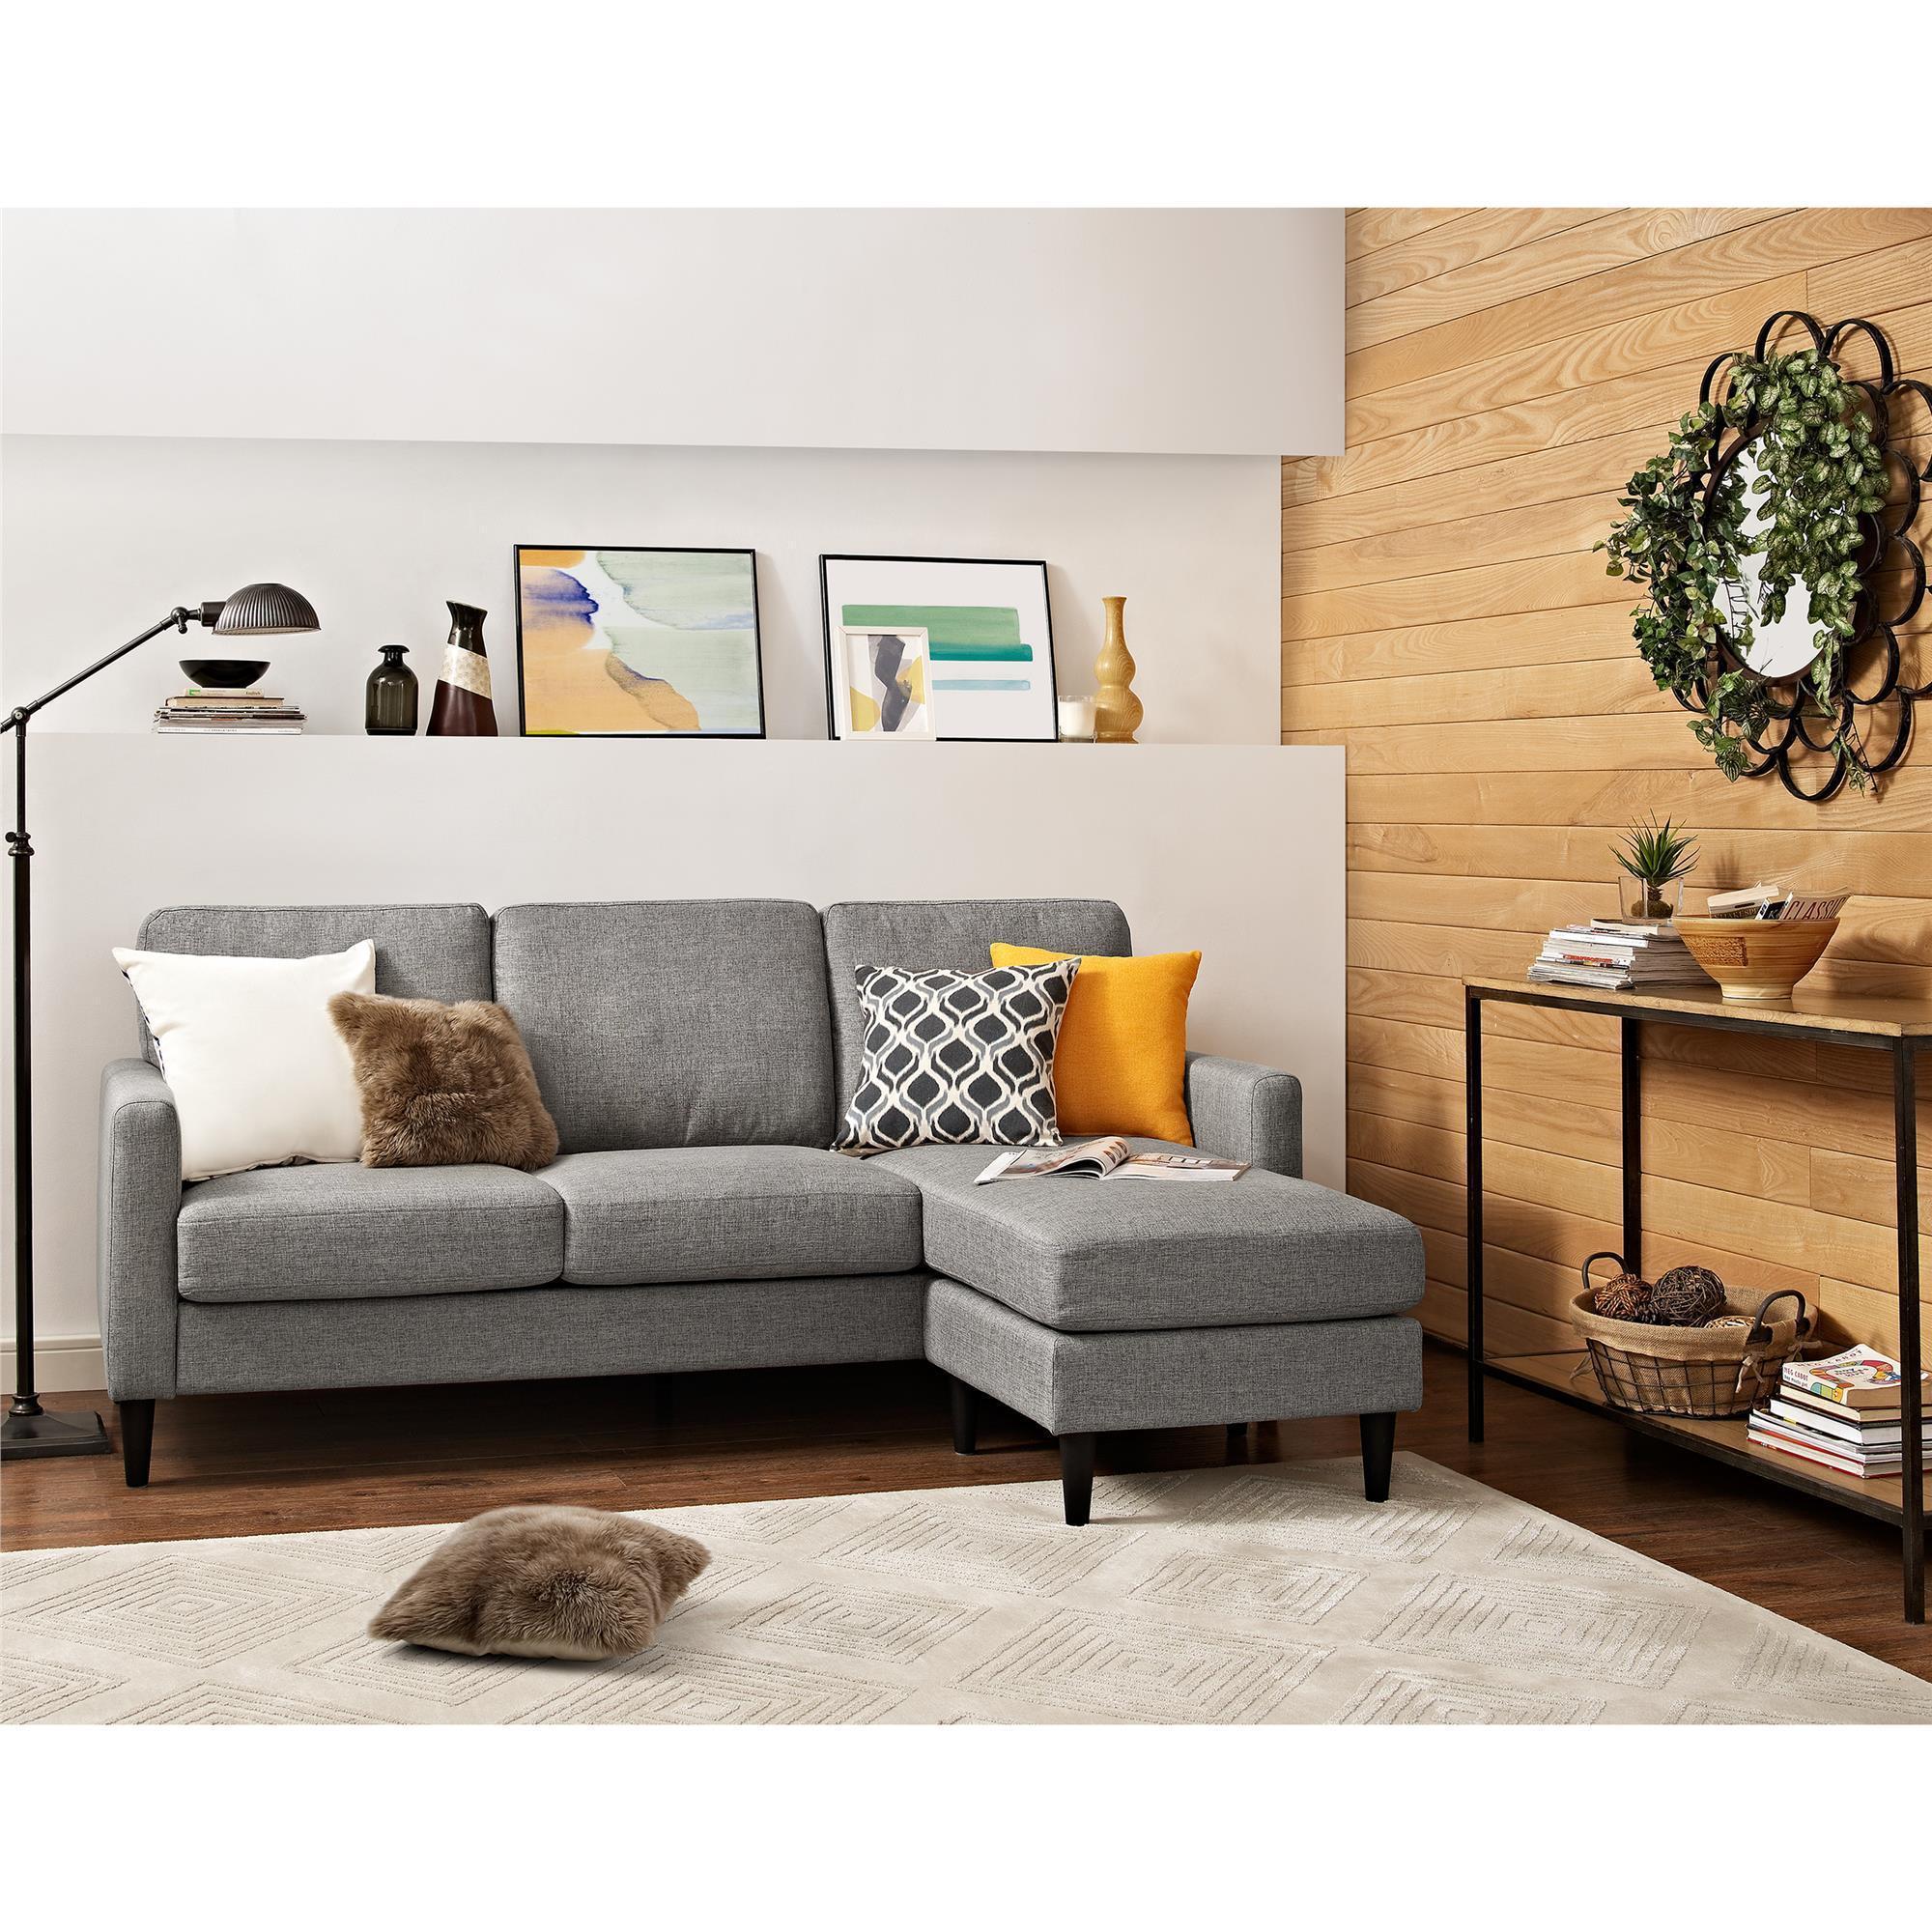 Shop dorel living kaci grey sectional sofa free shipping today overstock com 20187116